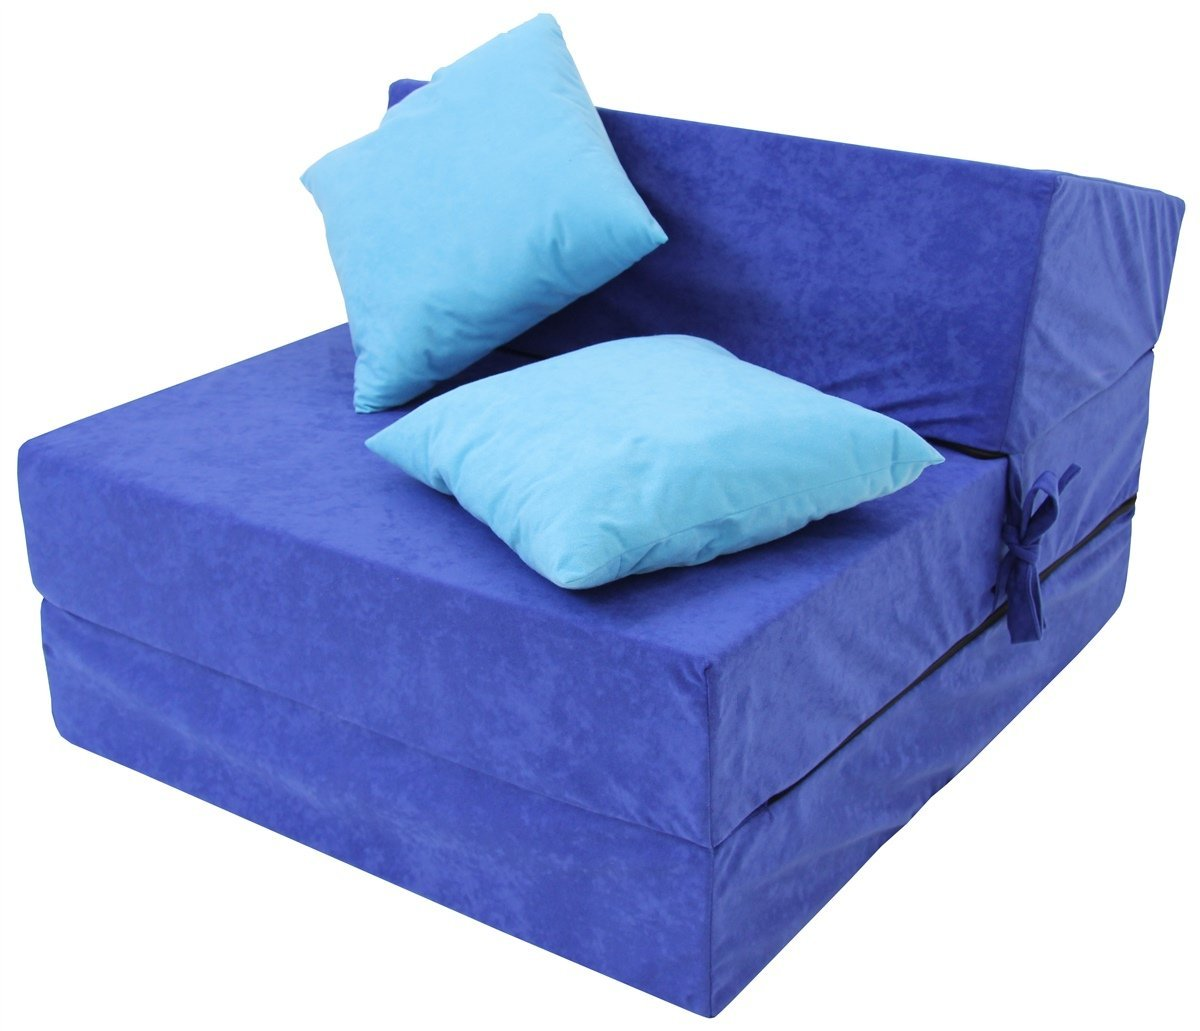 Schlafsessel Klappmatratze Faltmatratze Gästebett Bettsessel 200x70x15cm:  Amazon.de: Küche U0026 Haushalt